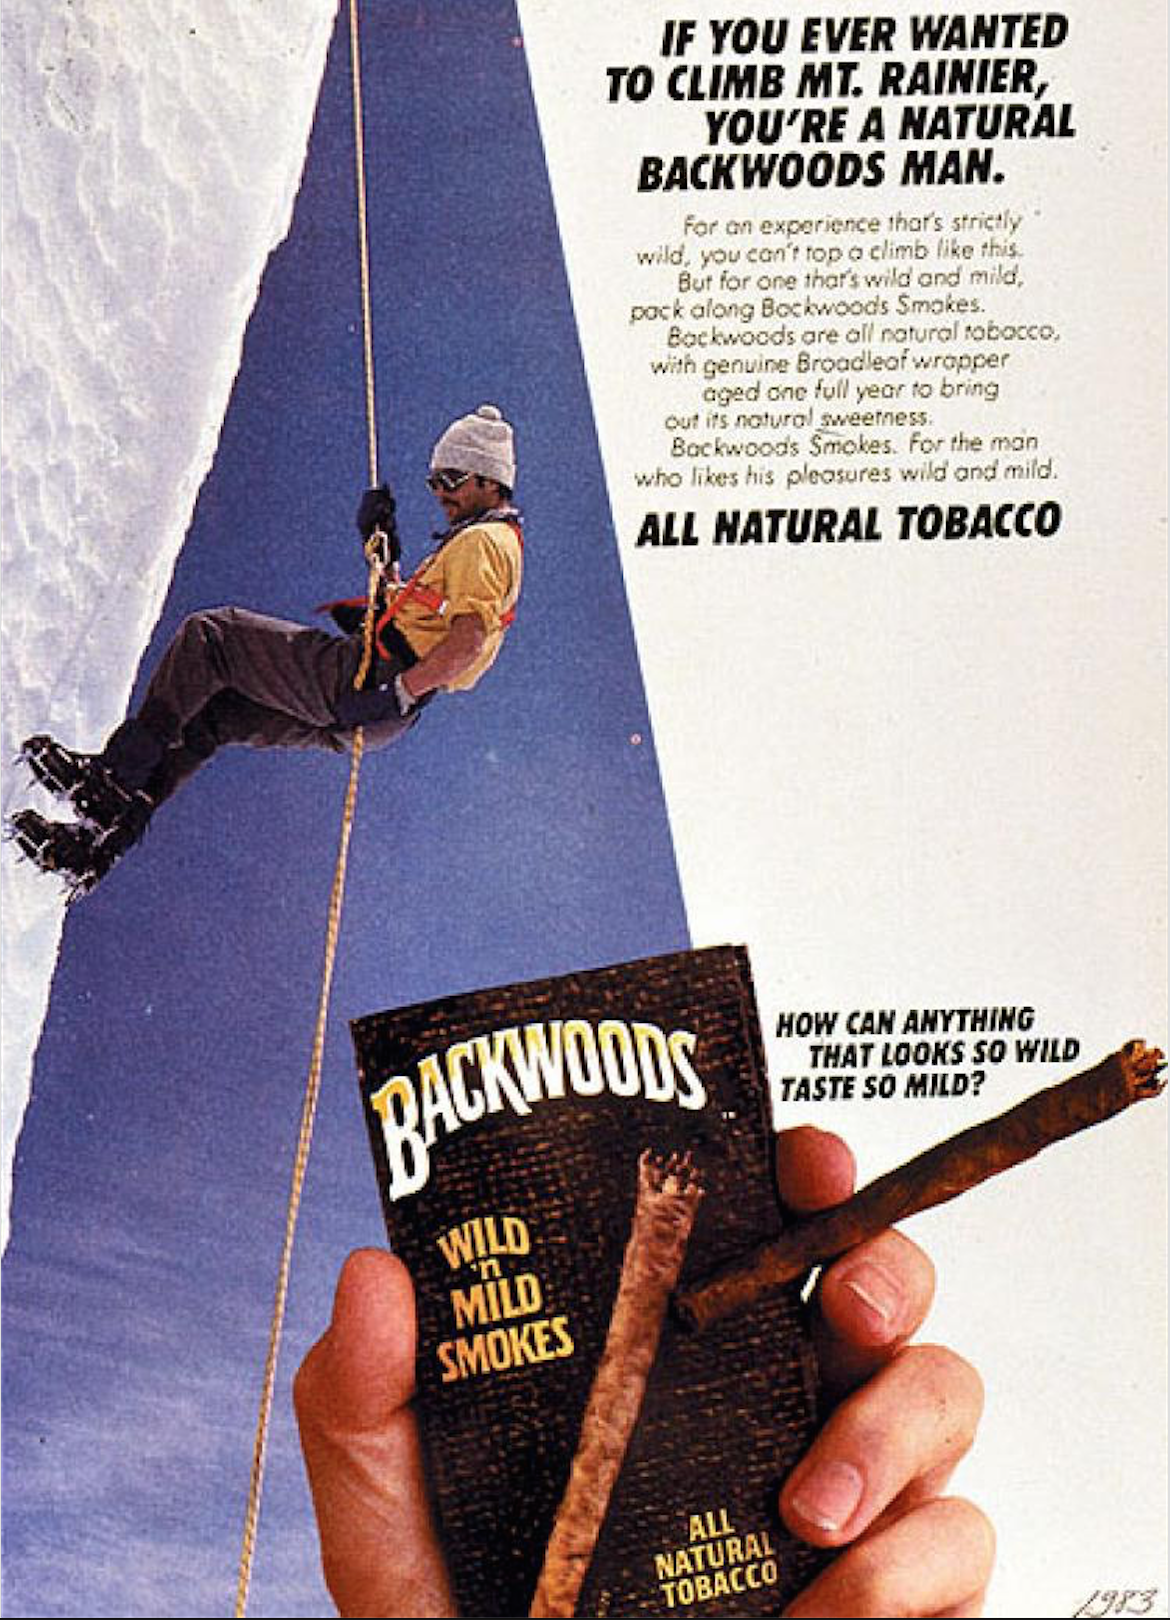 LOYAL NANA - The History of Backwoods Smokes